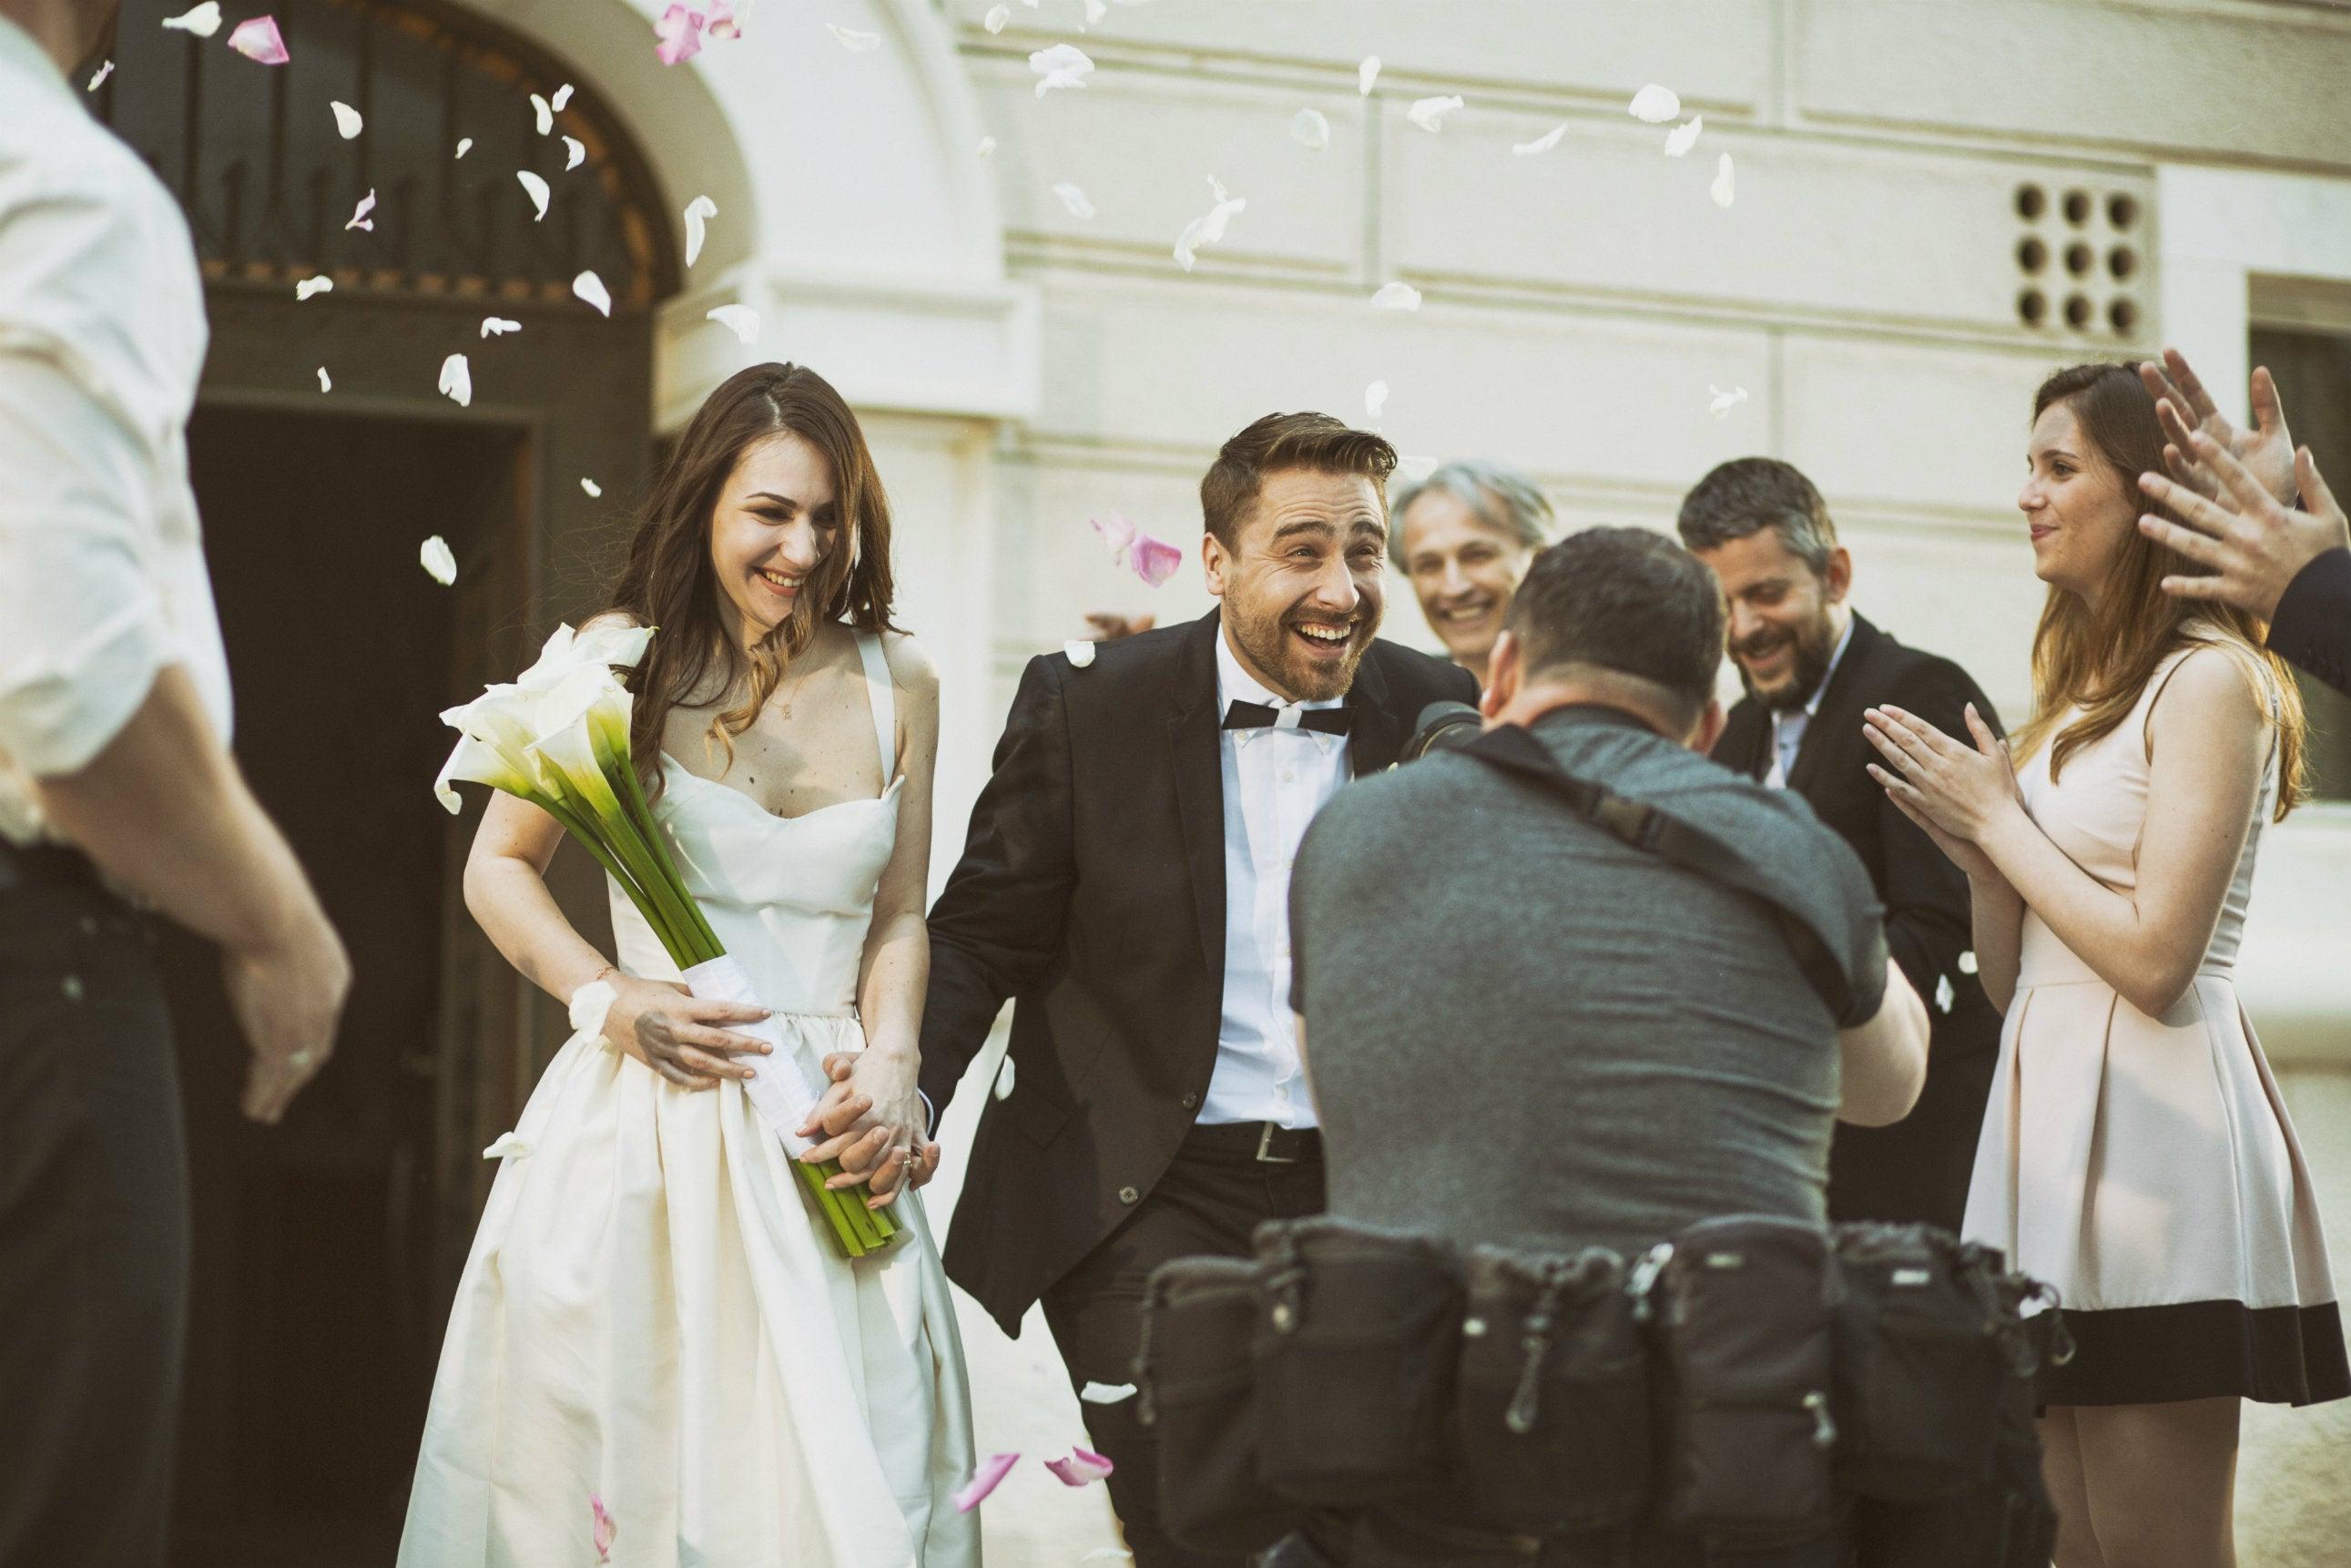 How to Plan a Fabulous Wedding on a Budget Creditcom